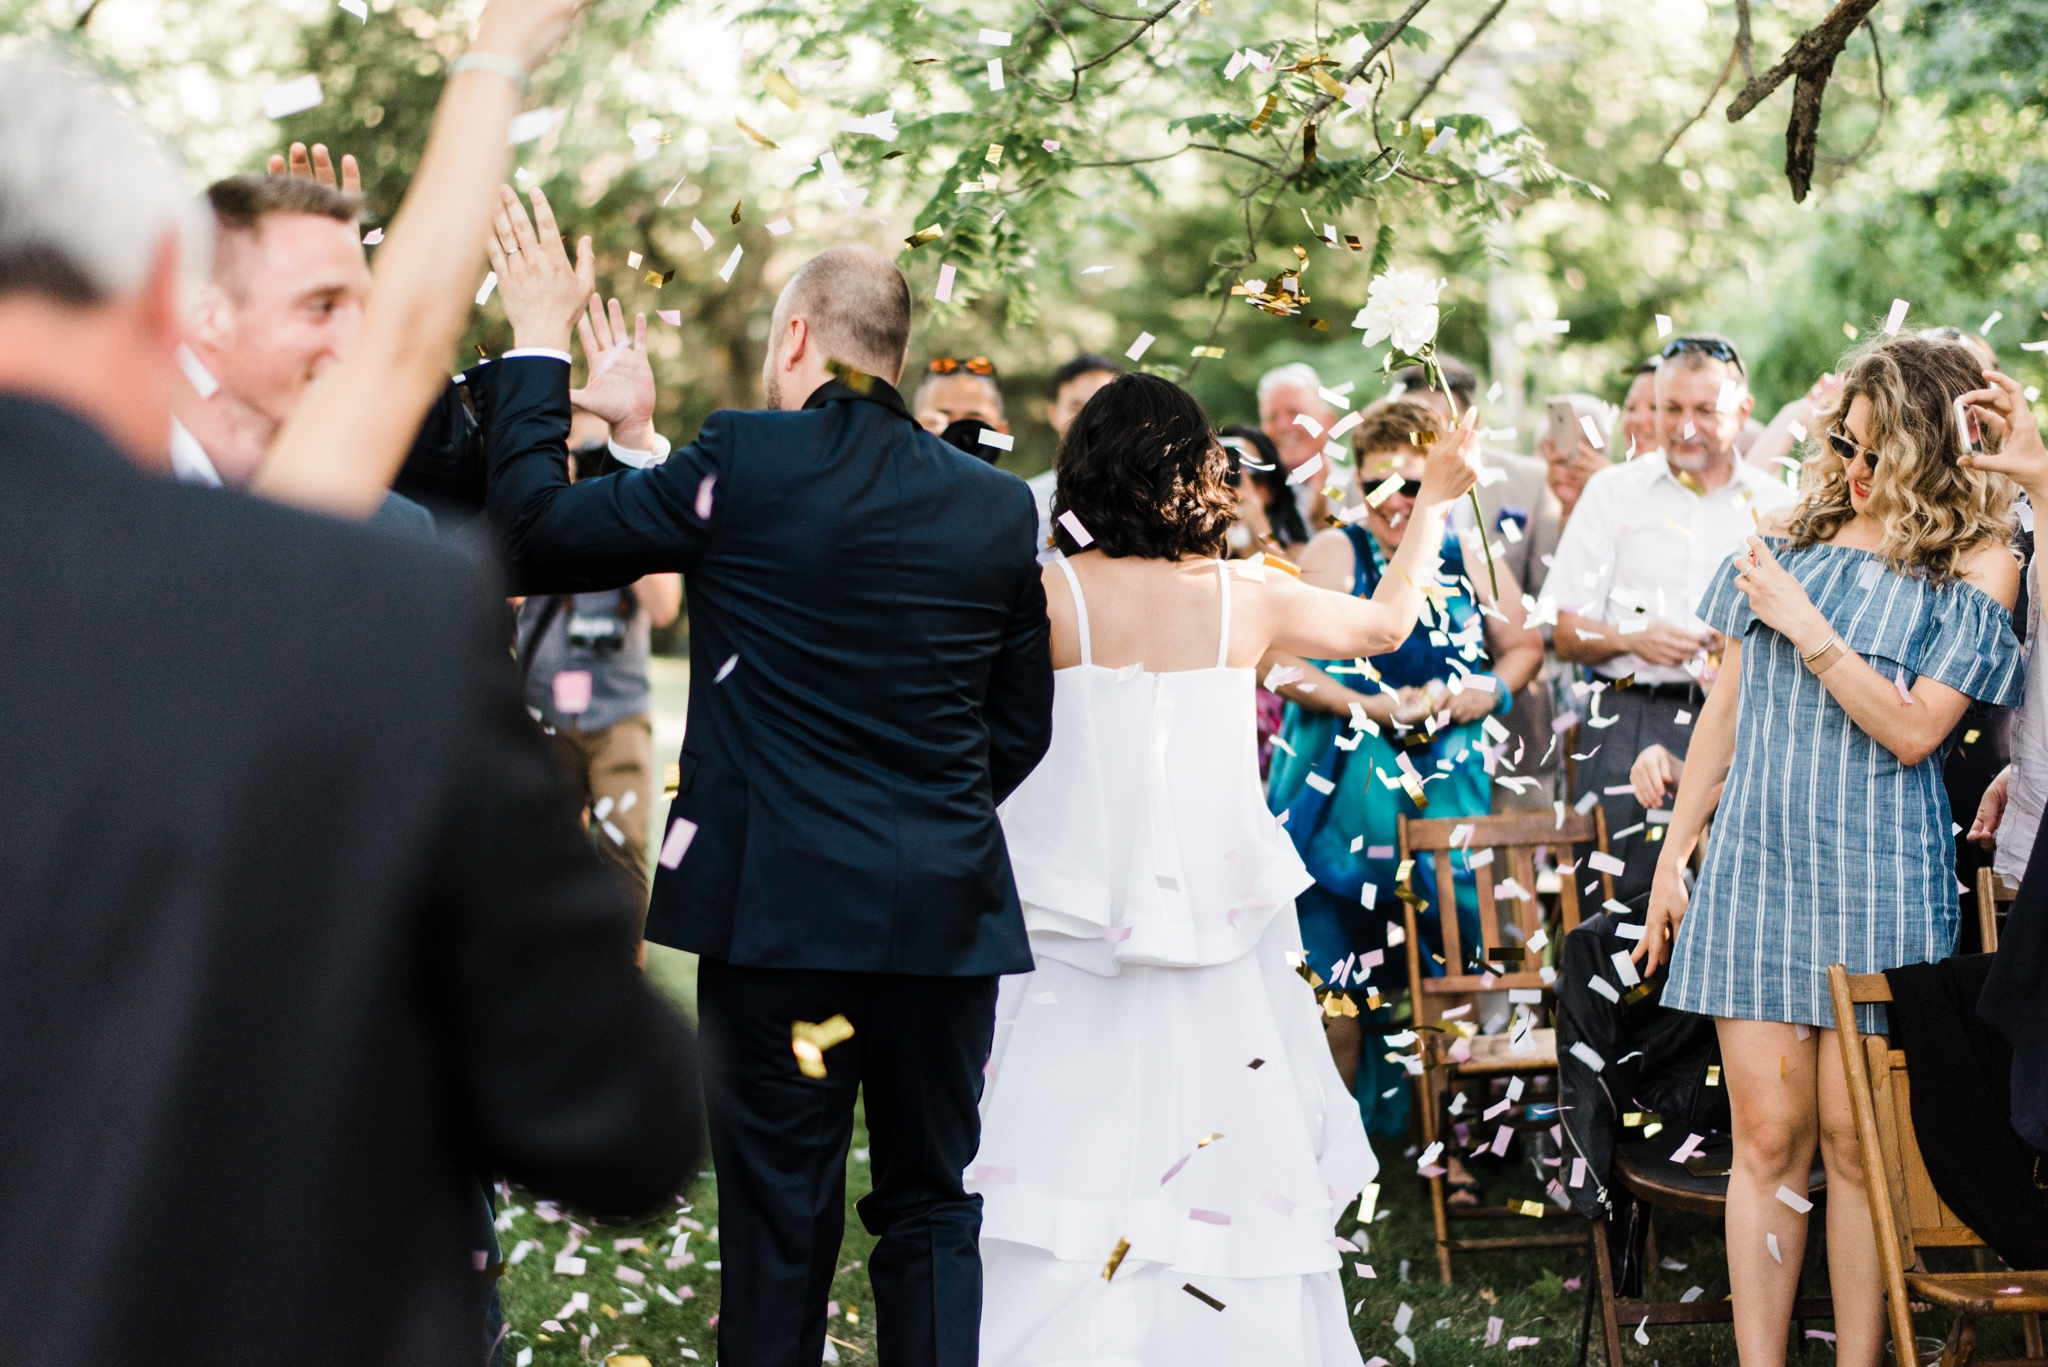 Illinois_backyard_wedding_0012.jpg